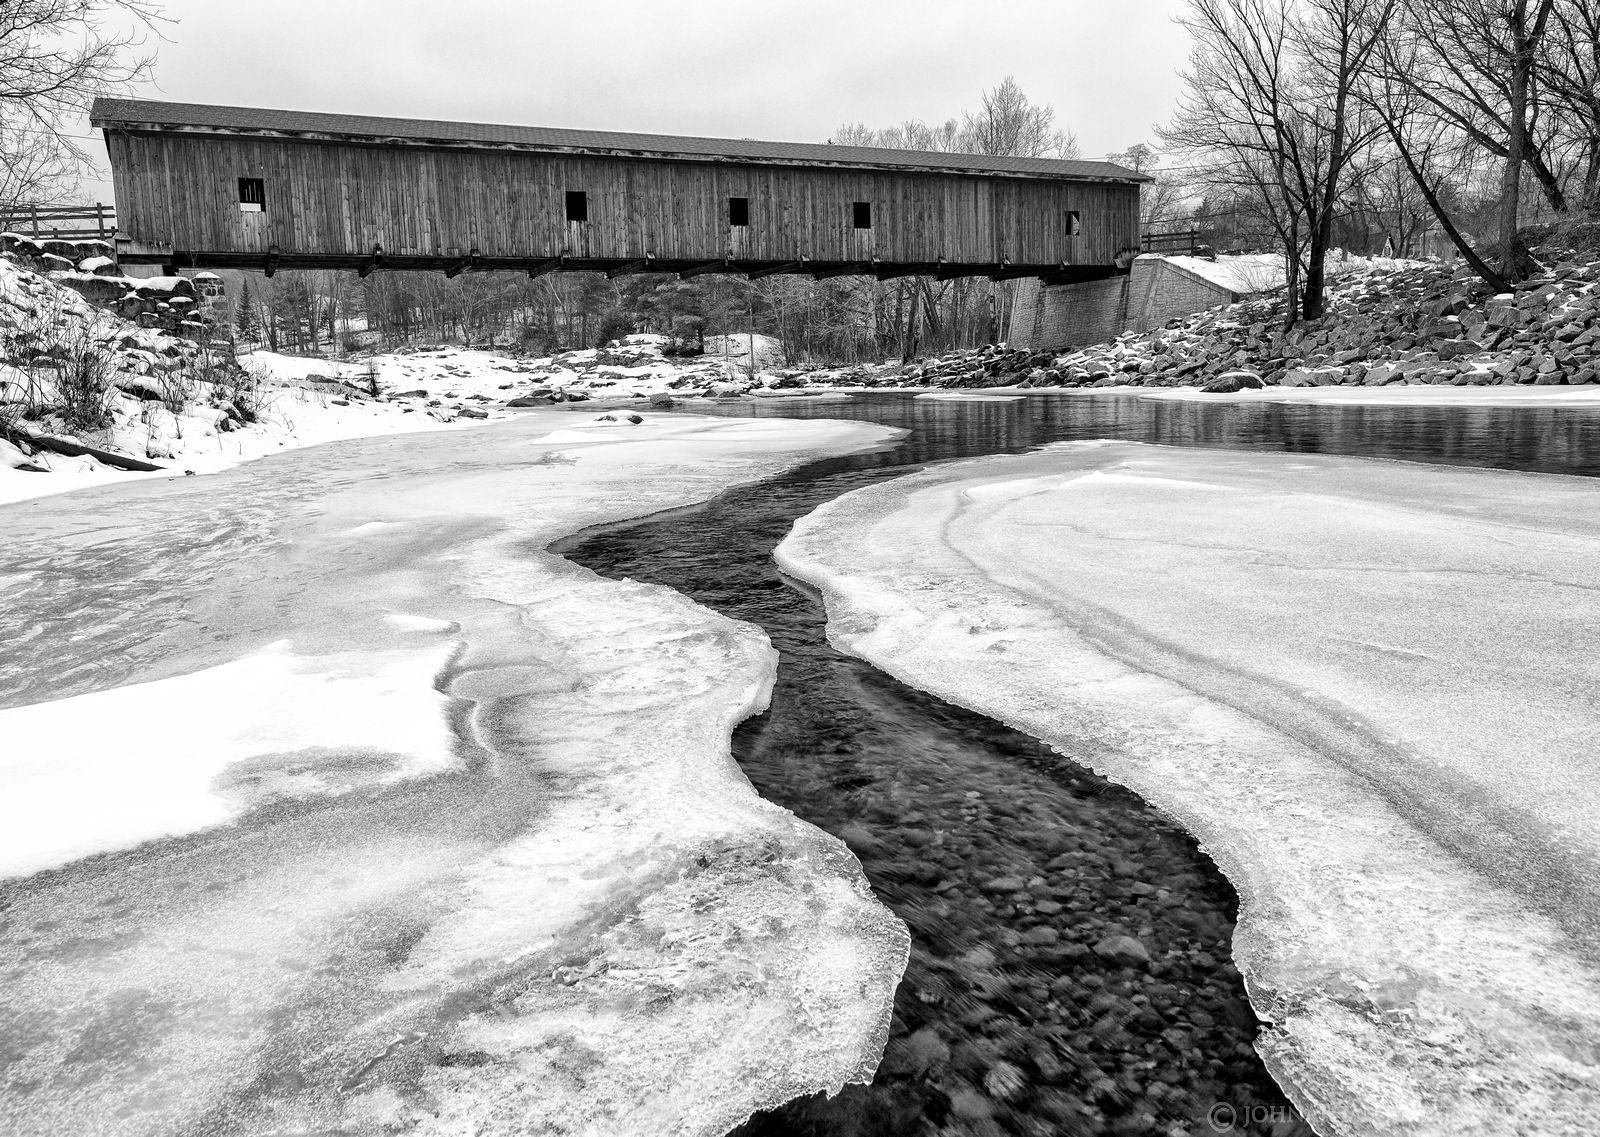 Jay covered bridge,Jay,covered bridge,winter,black and white